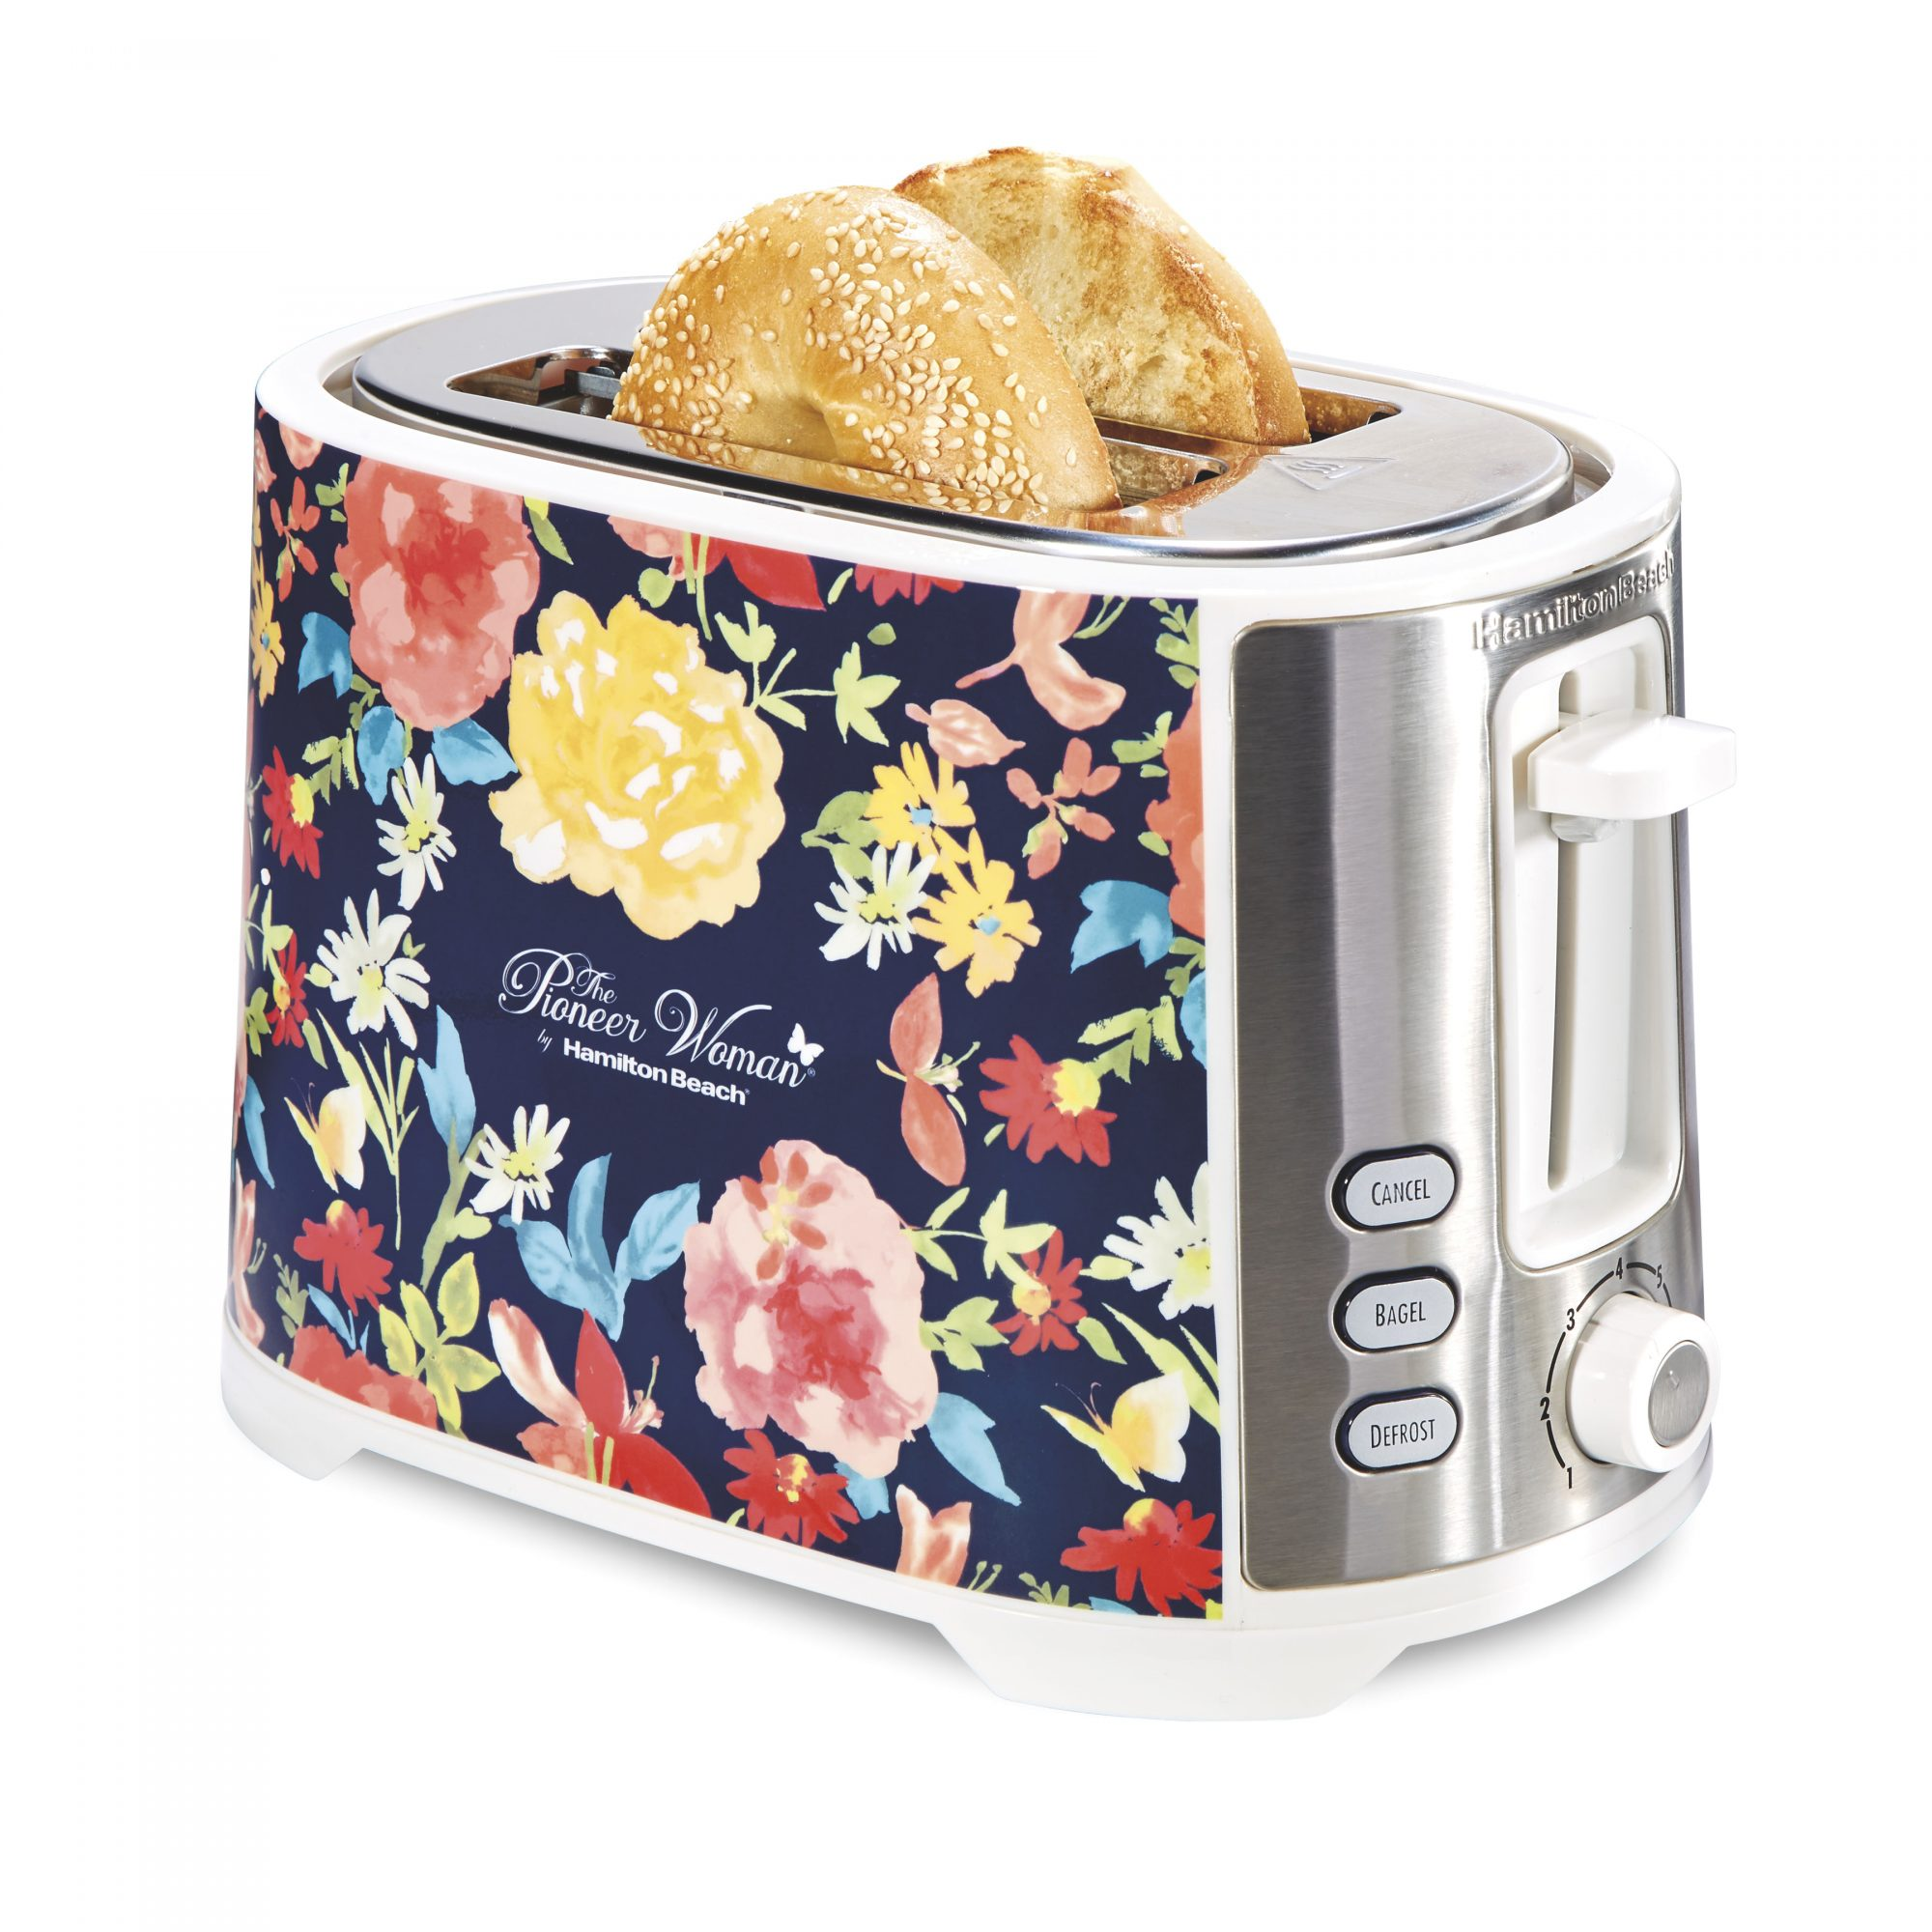 Pioneer Woman Walmart Toaster